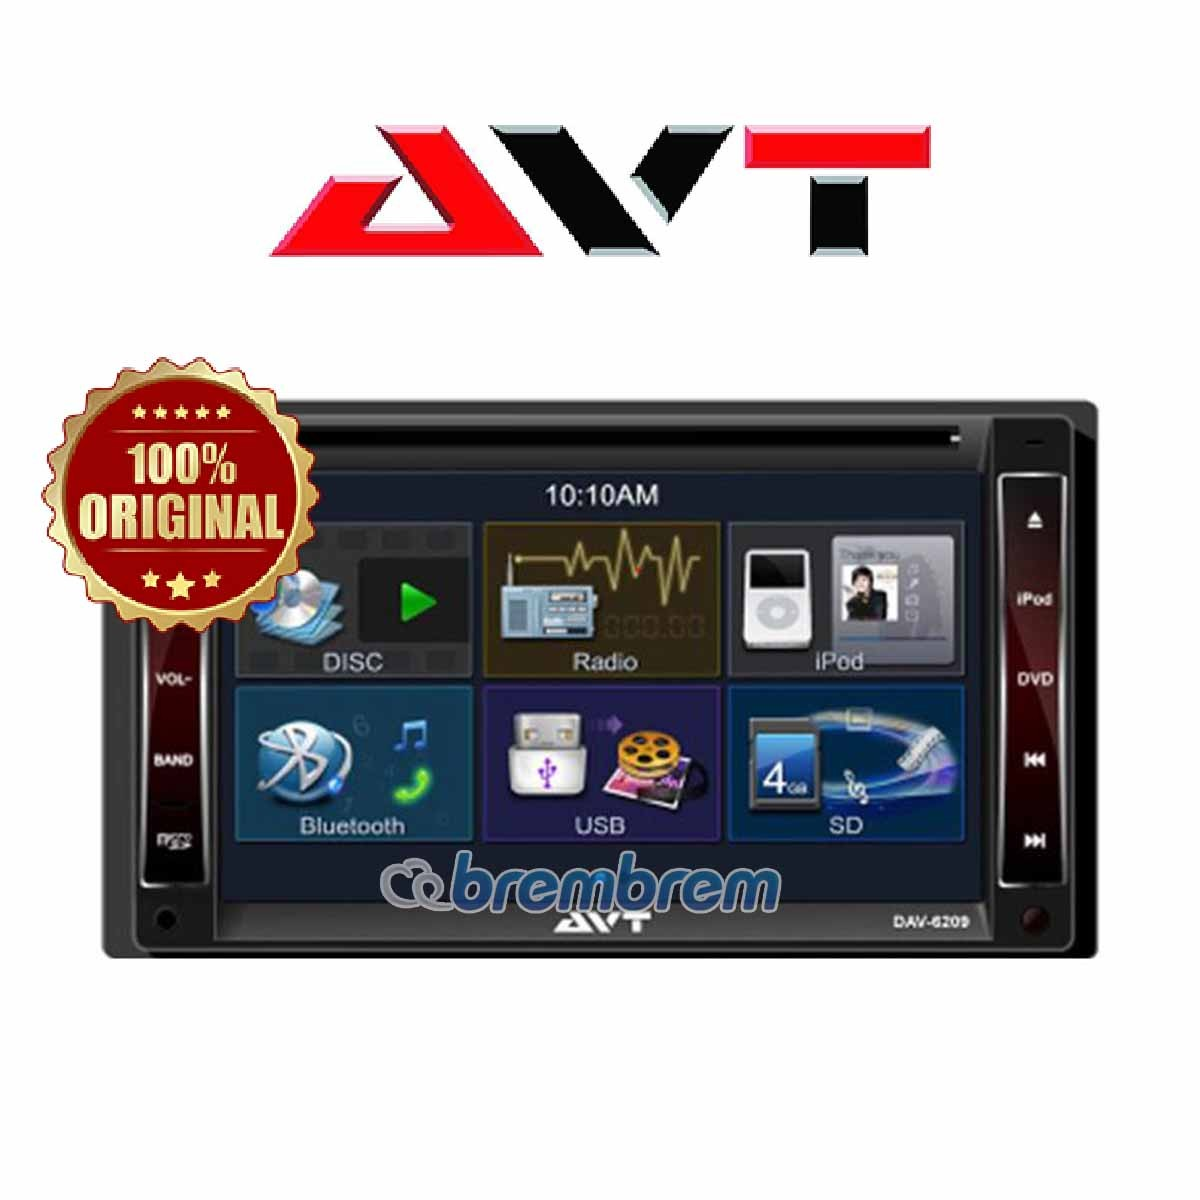 AVT DAV 6209 GPS - HEADUNIT DOUBLE DIN